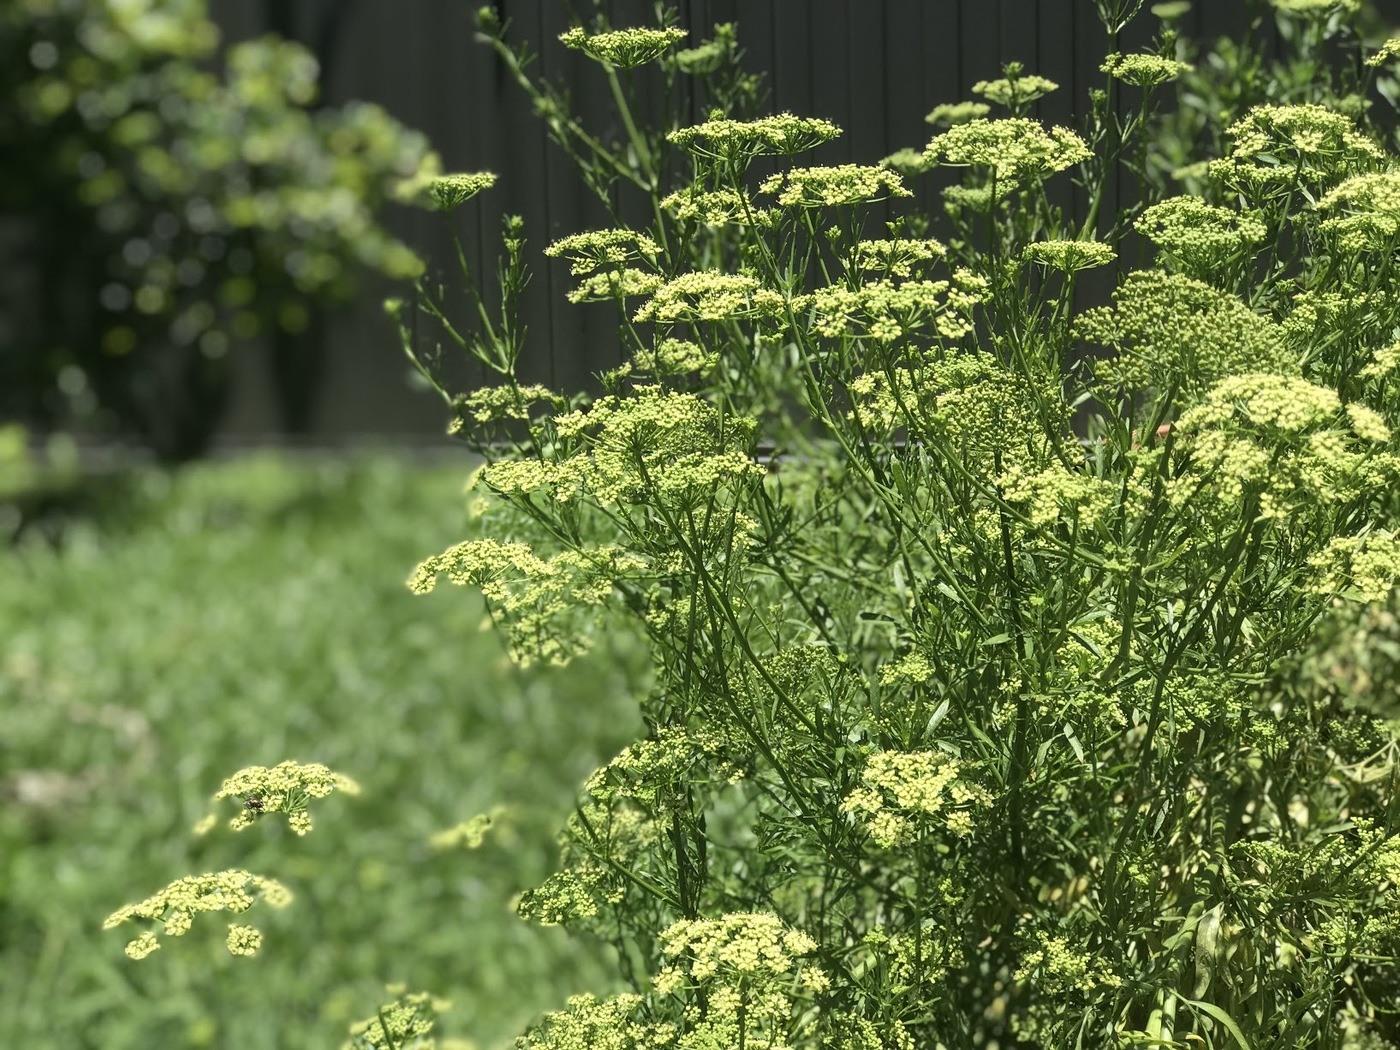 Coriander flowering